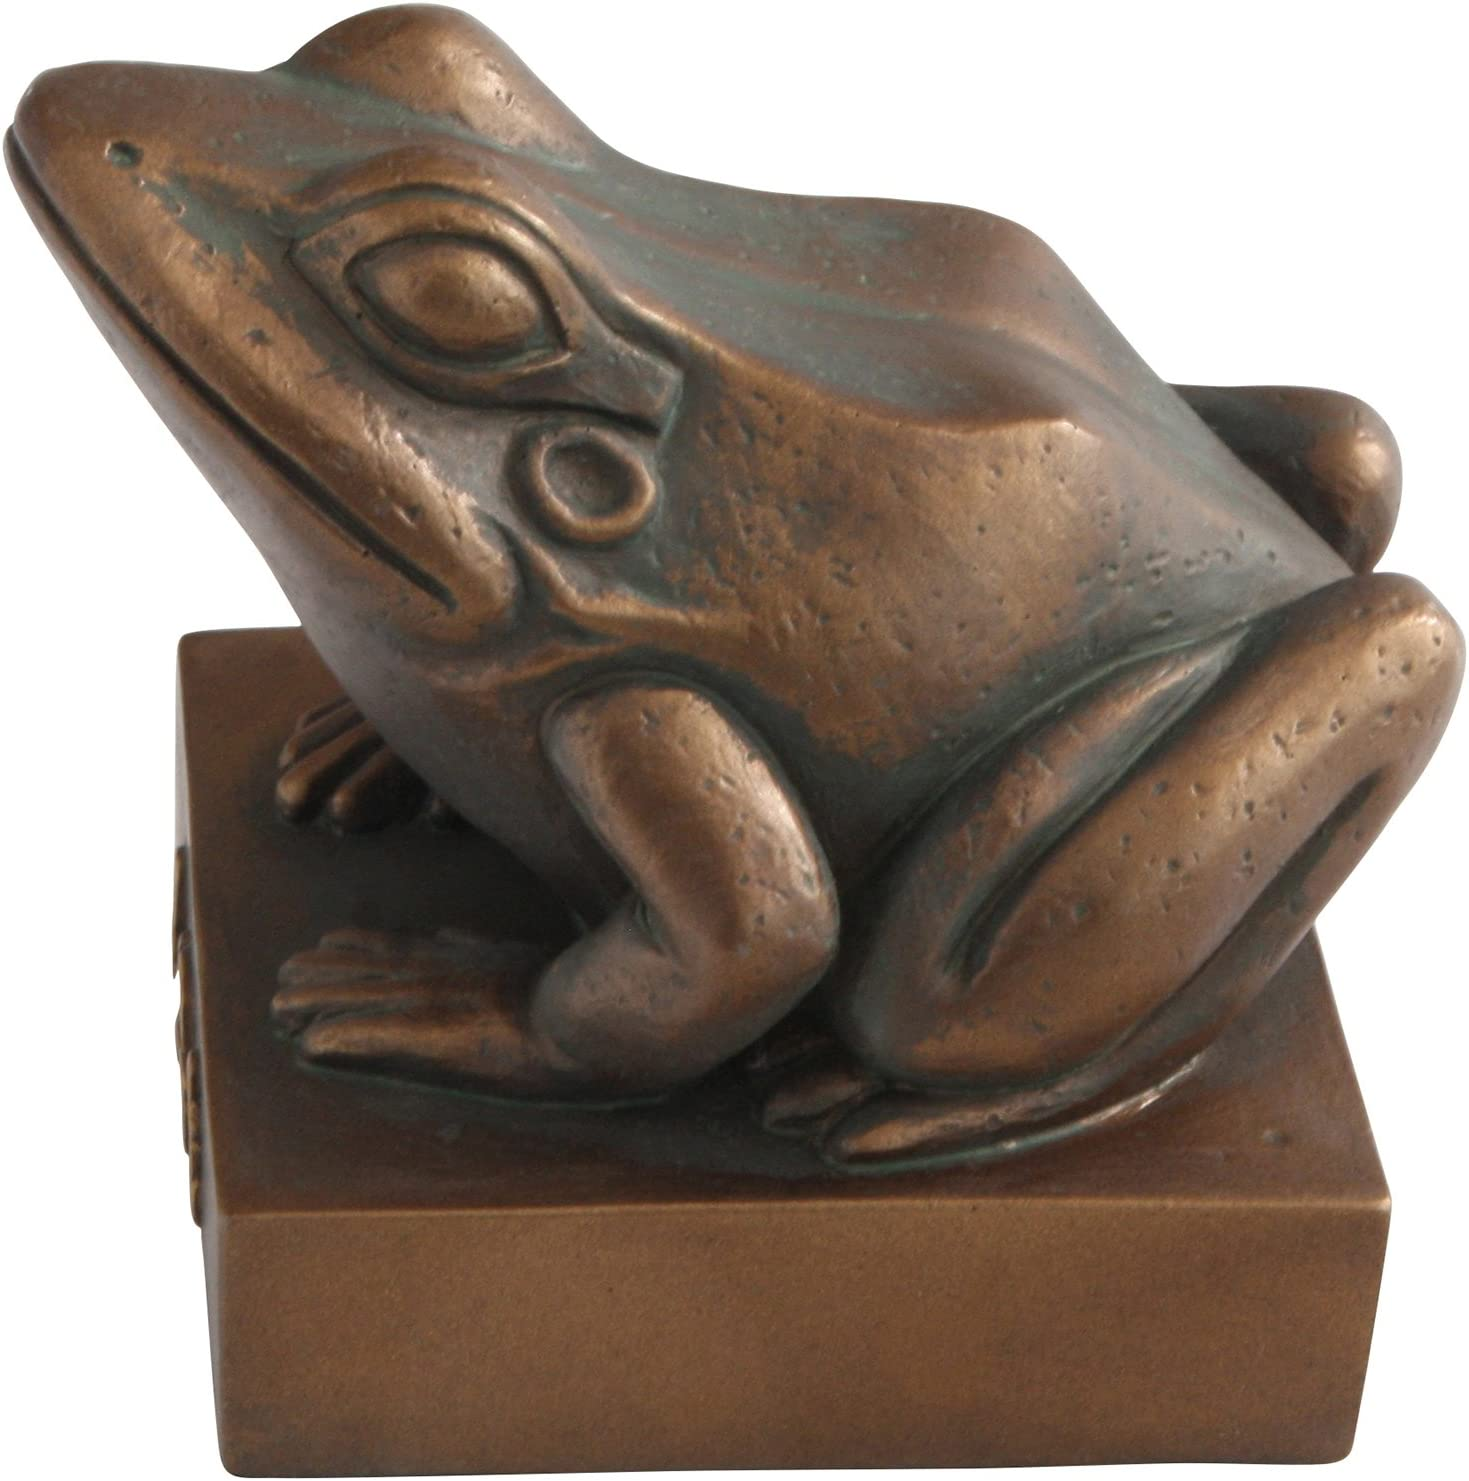 frog Heket Kek Egyptian goddess statue with bronze trim House of ancient treasur